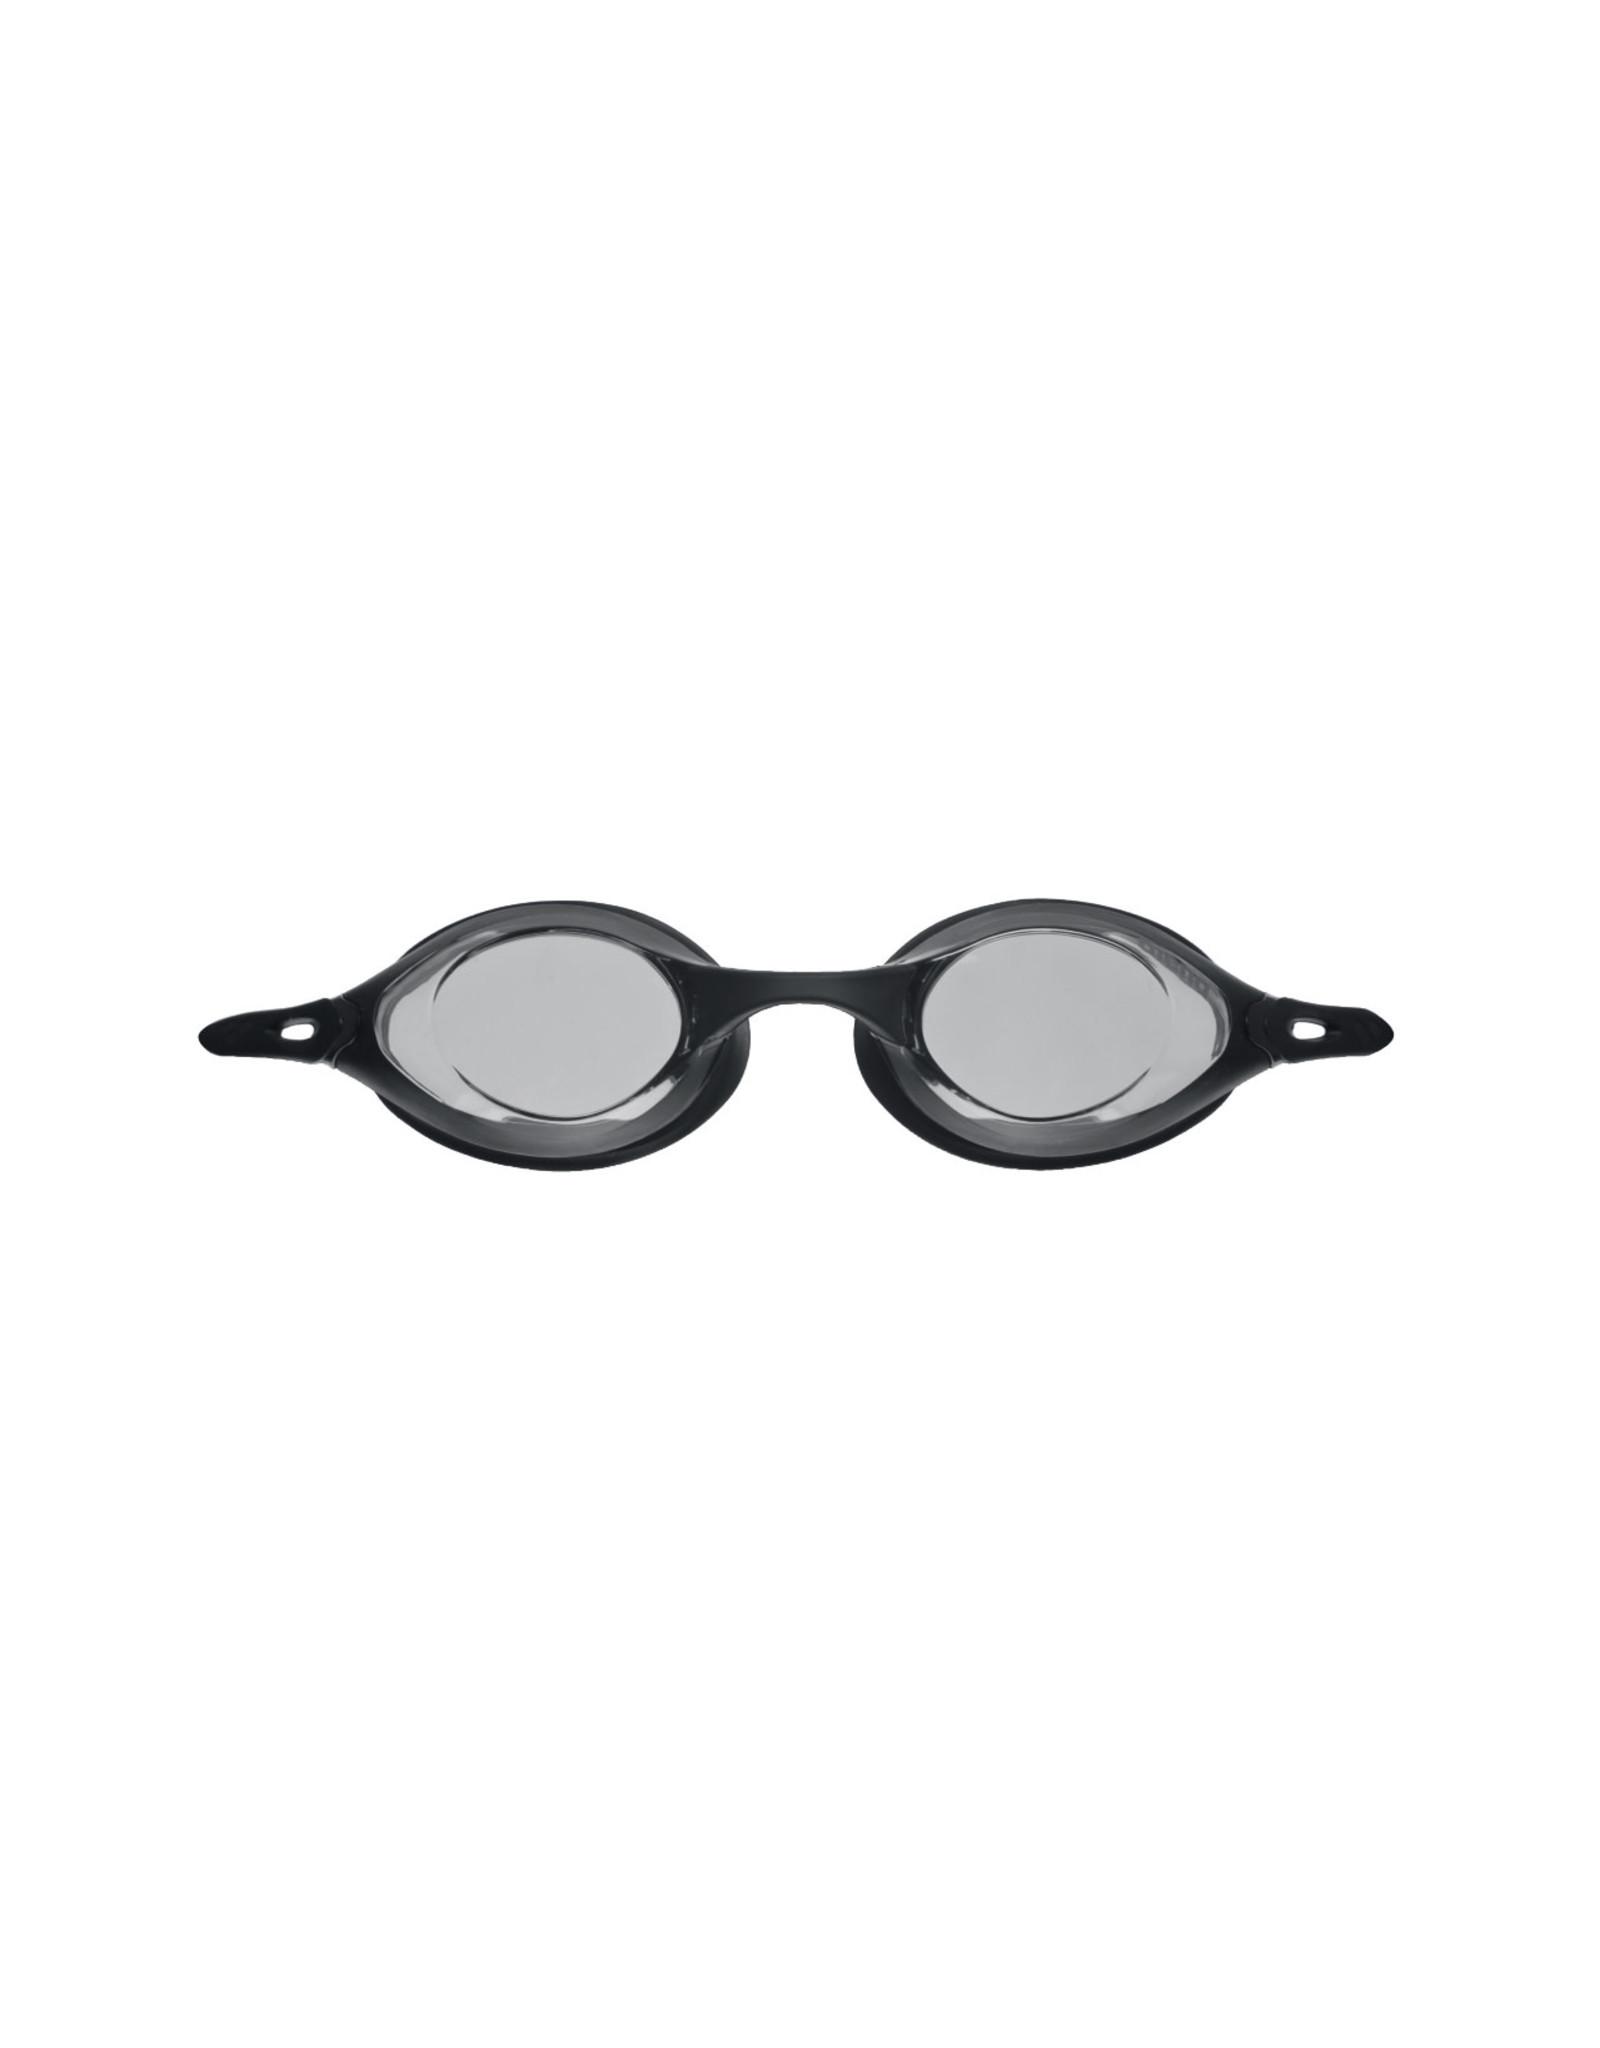 Arena Cobra Goggles - 92355